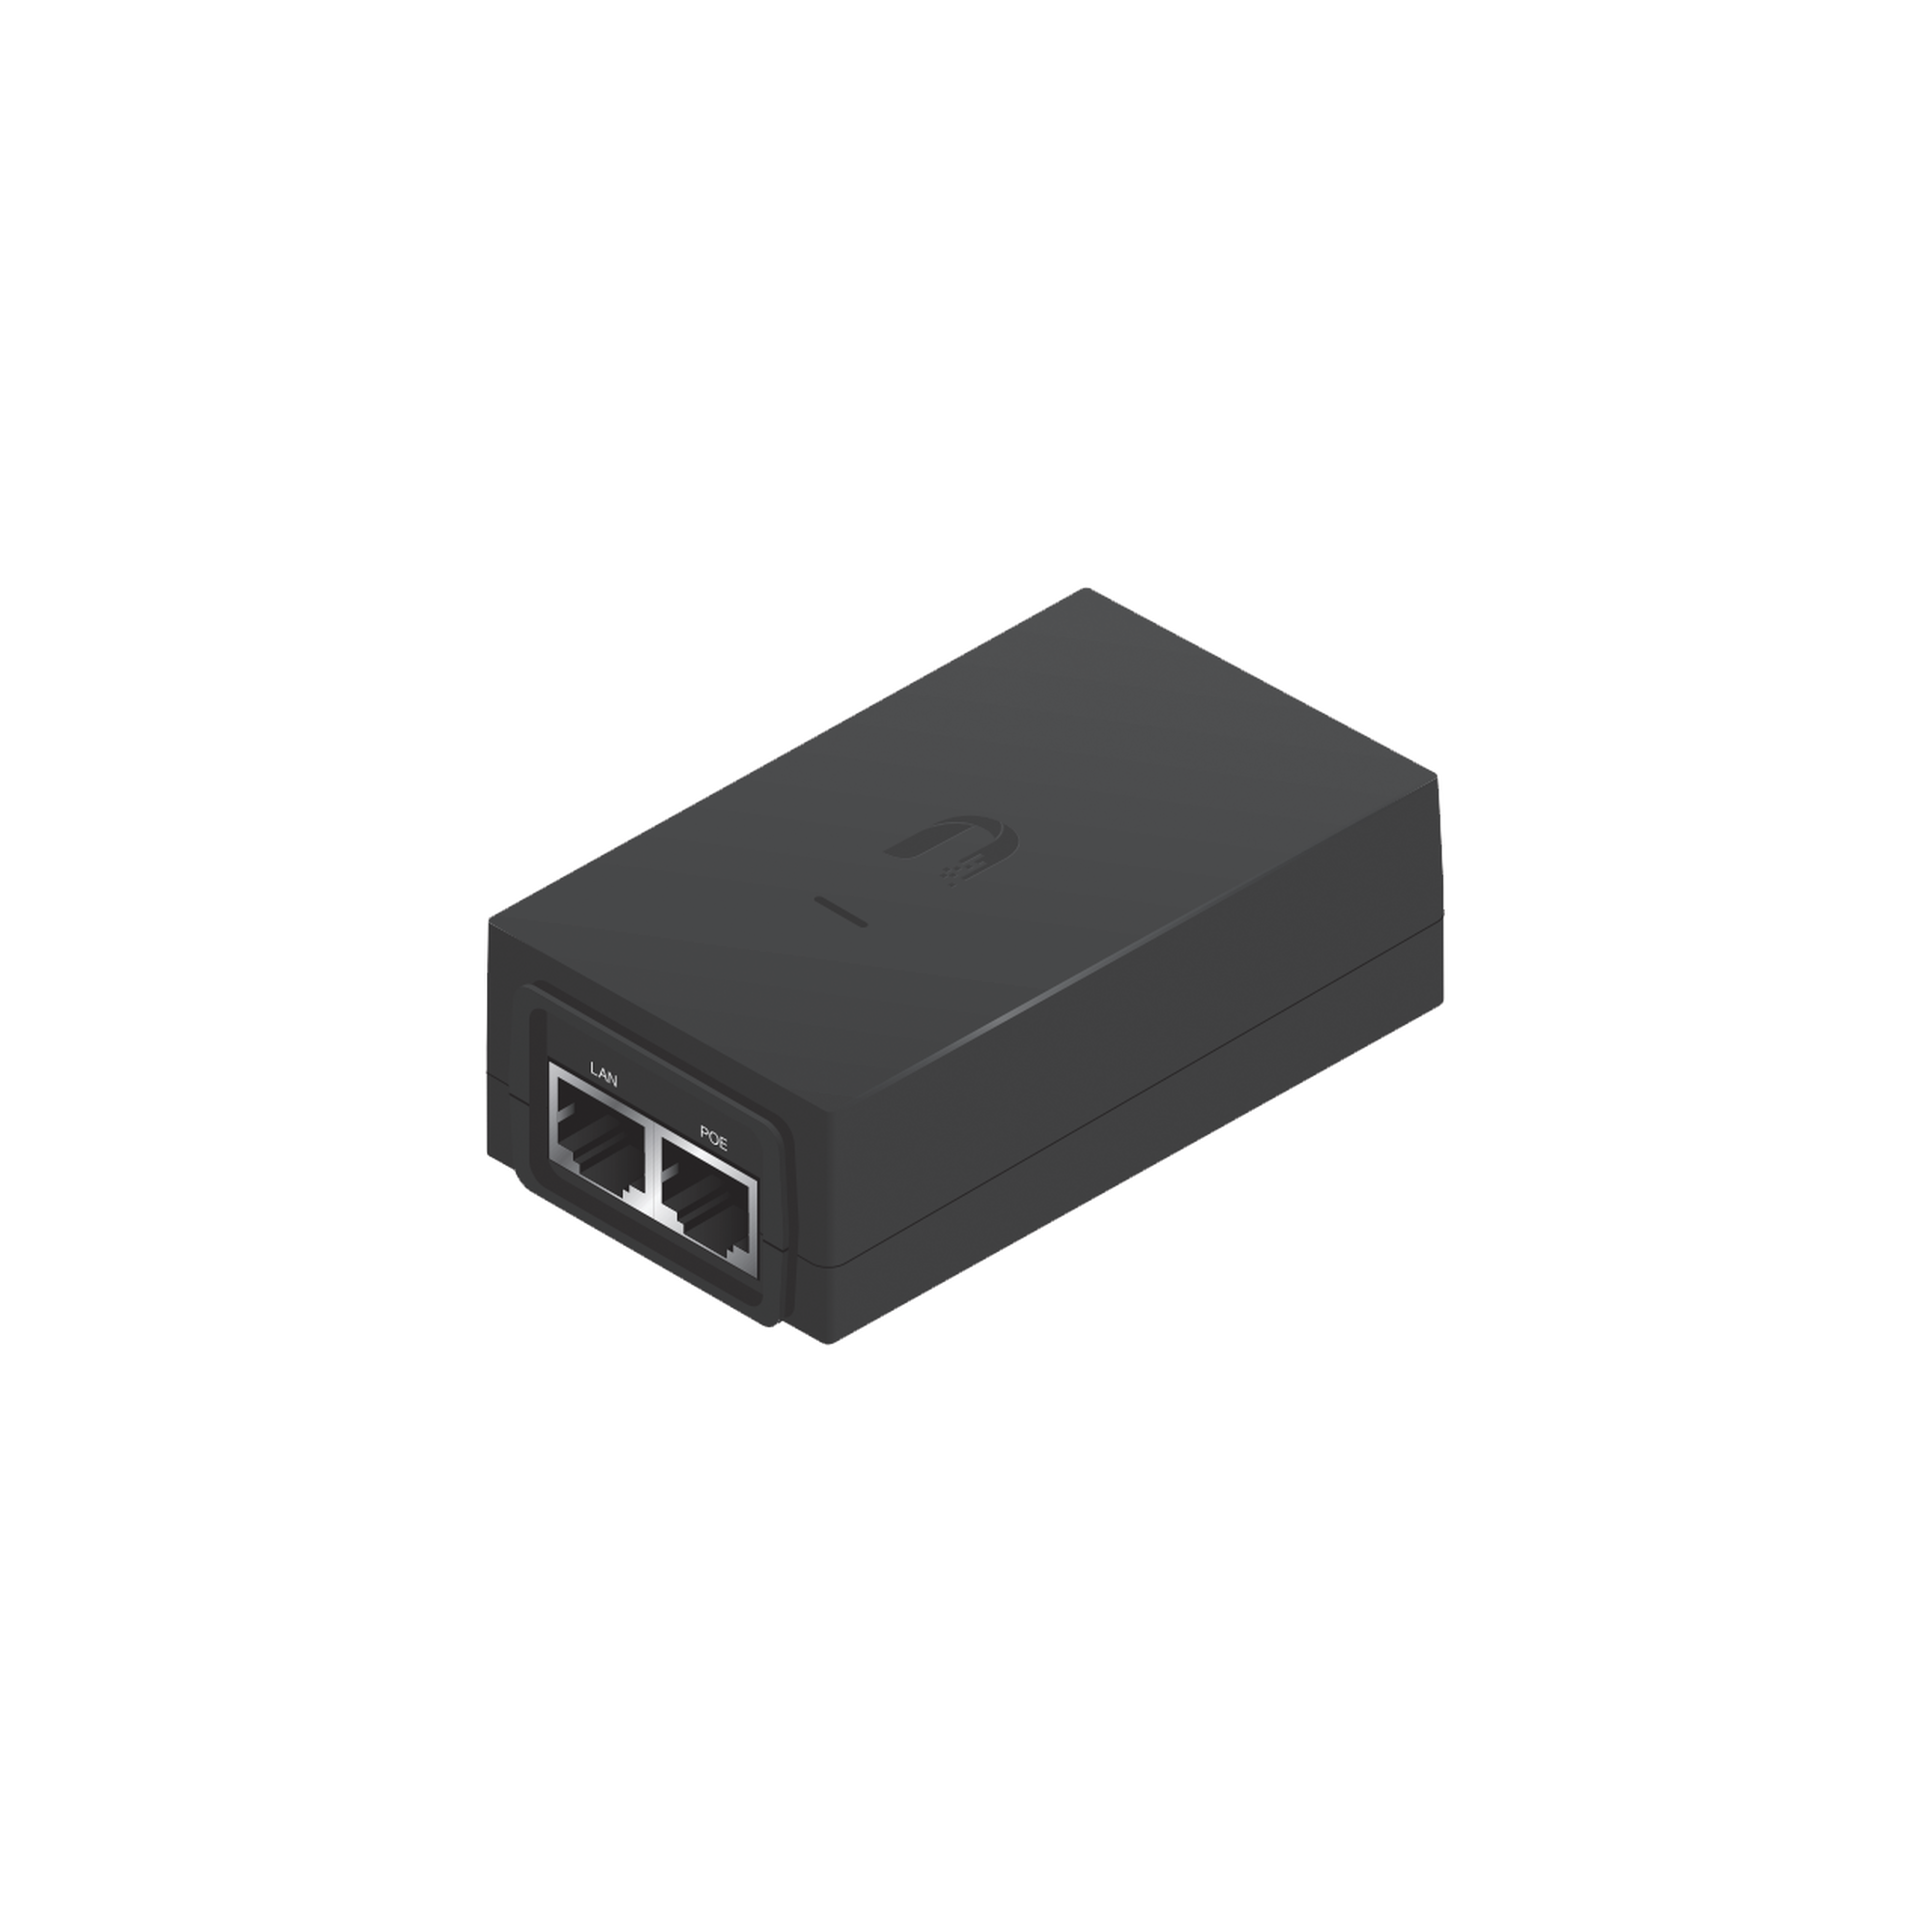 Adaptador PoE Ubiquiti de 50 VDC, 1.2 A puerto Gigabit para equipos airFiber